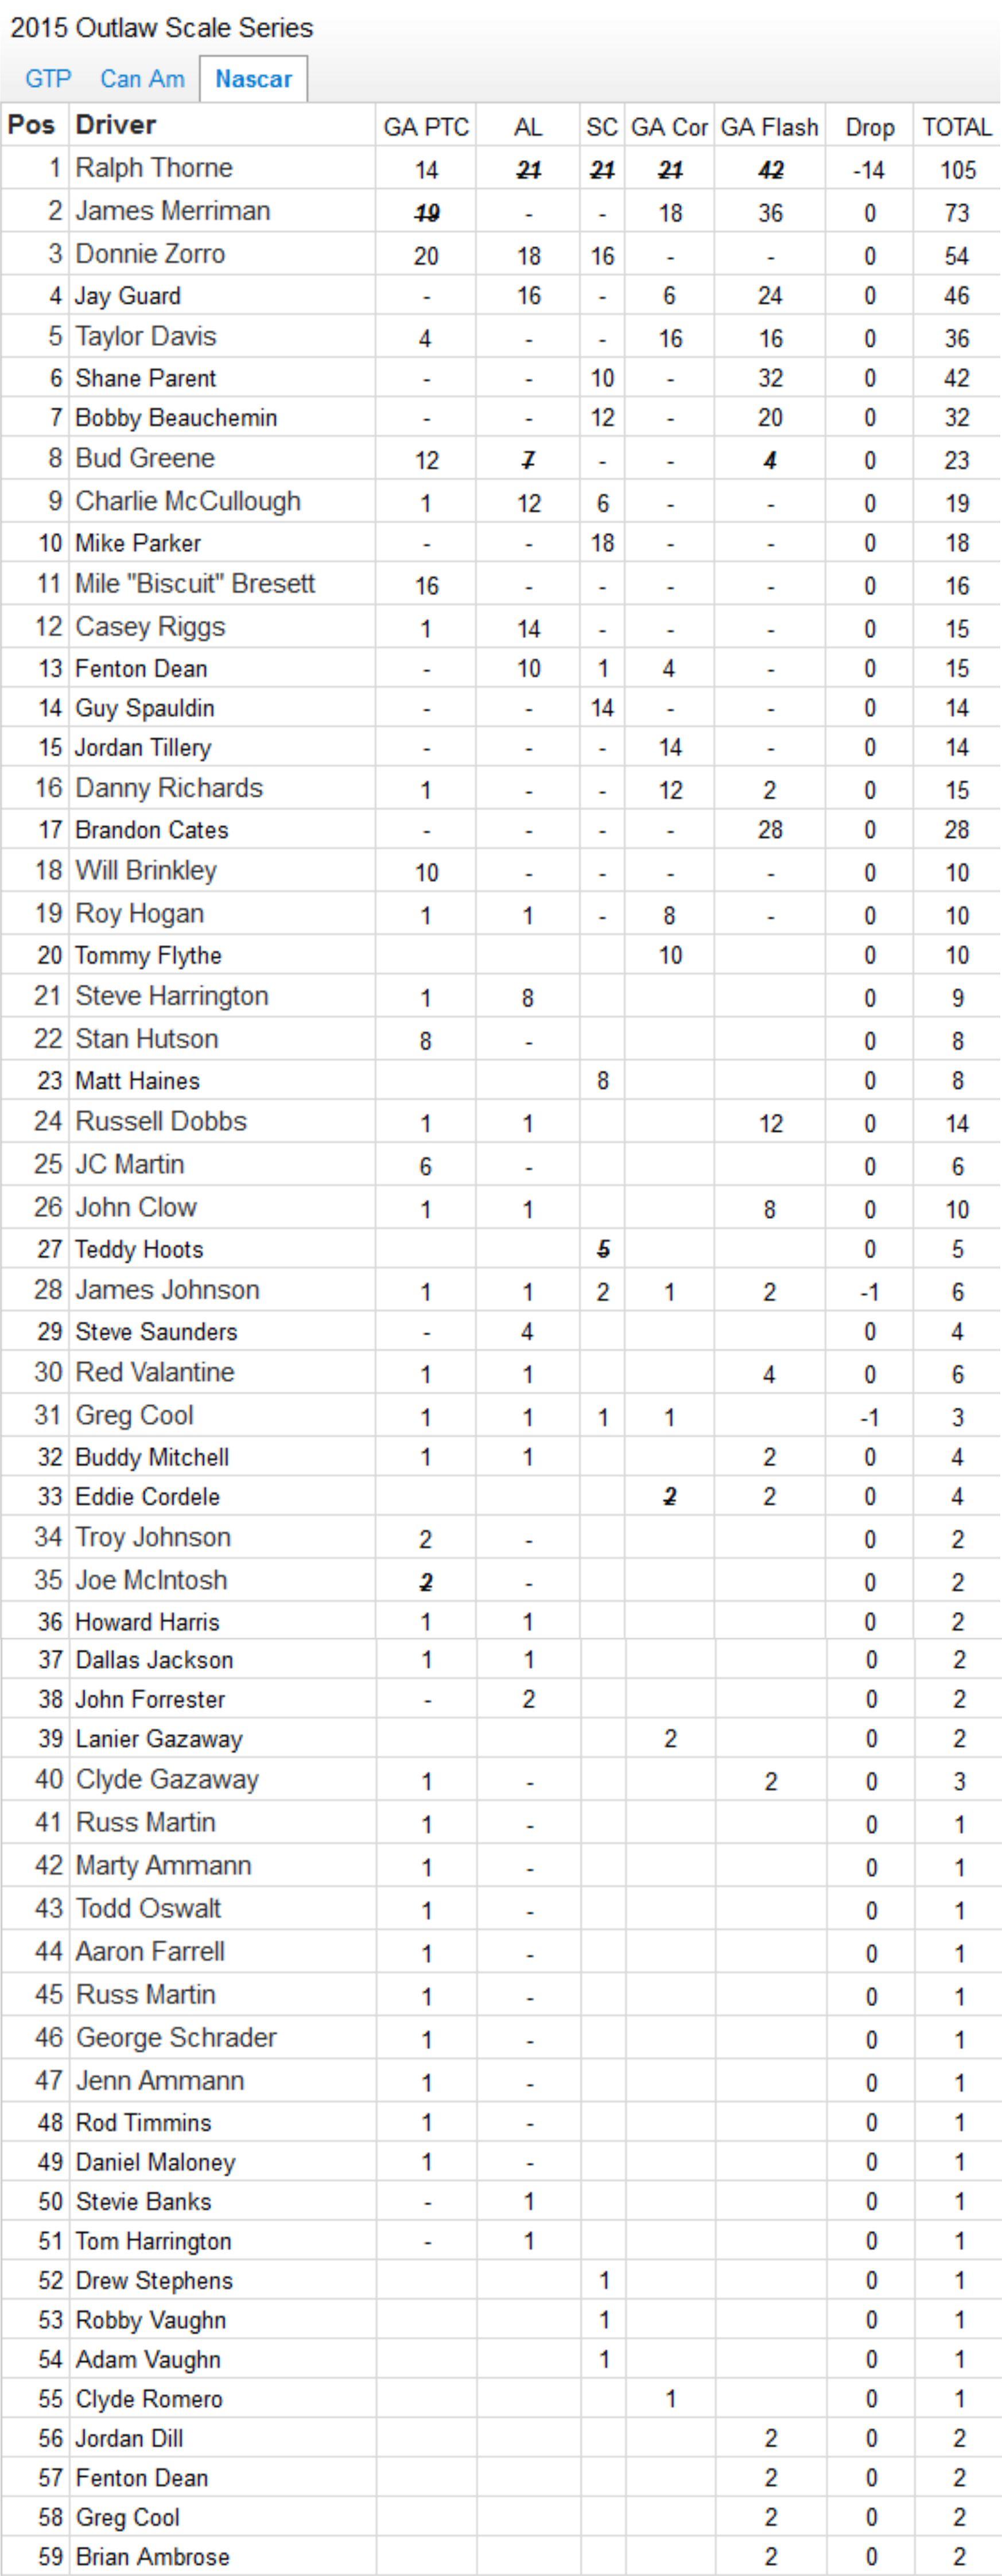 2015 Final Nascar Points.jpg